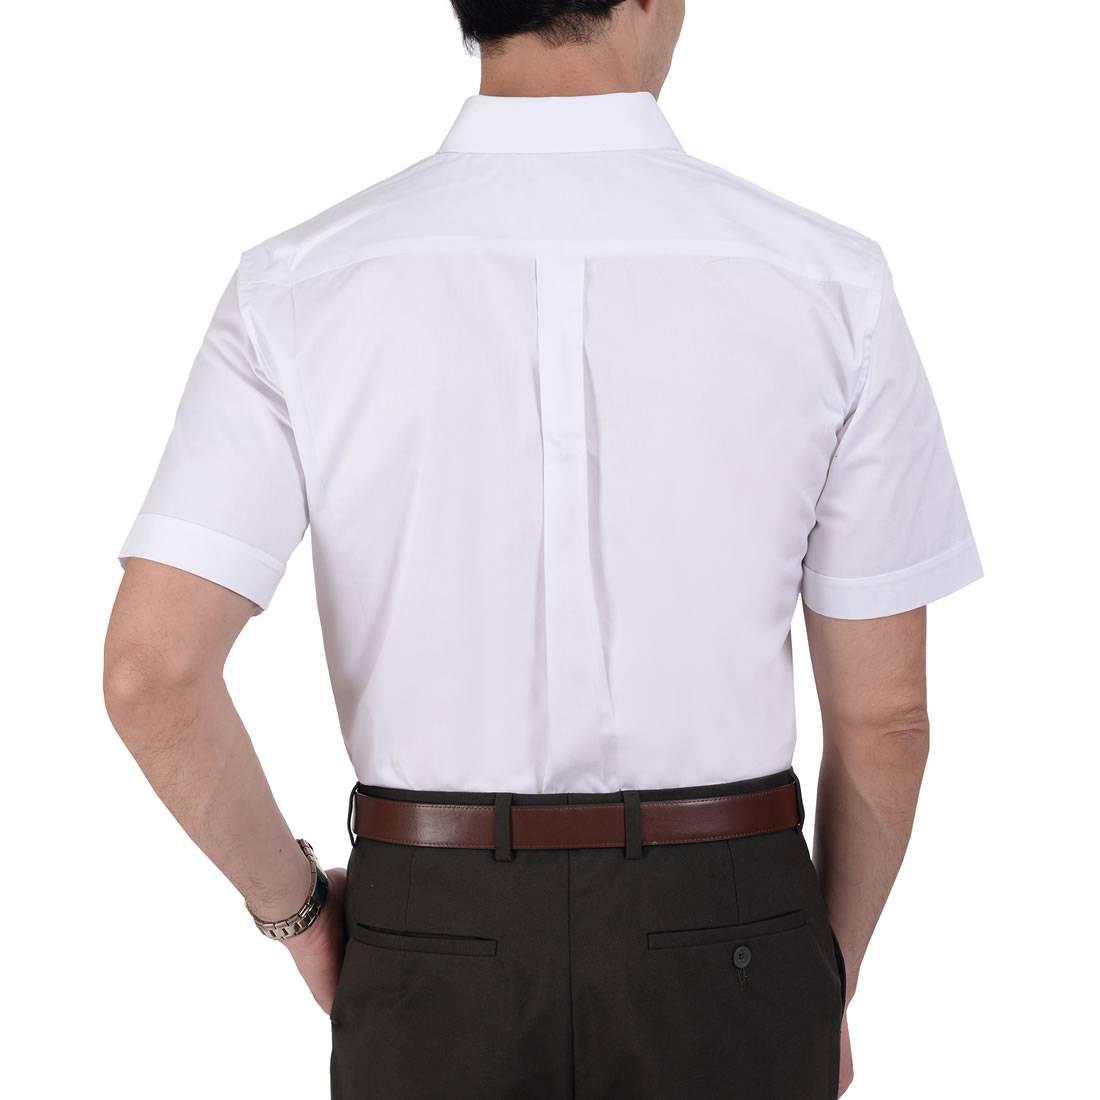 042331381702-02-Camisa-Manga-Corta-classic-Fit-Blanco-yale